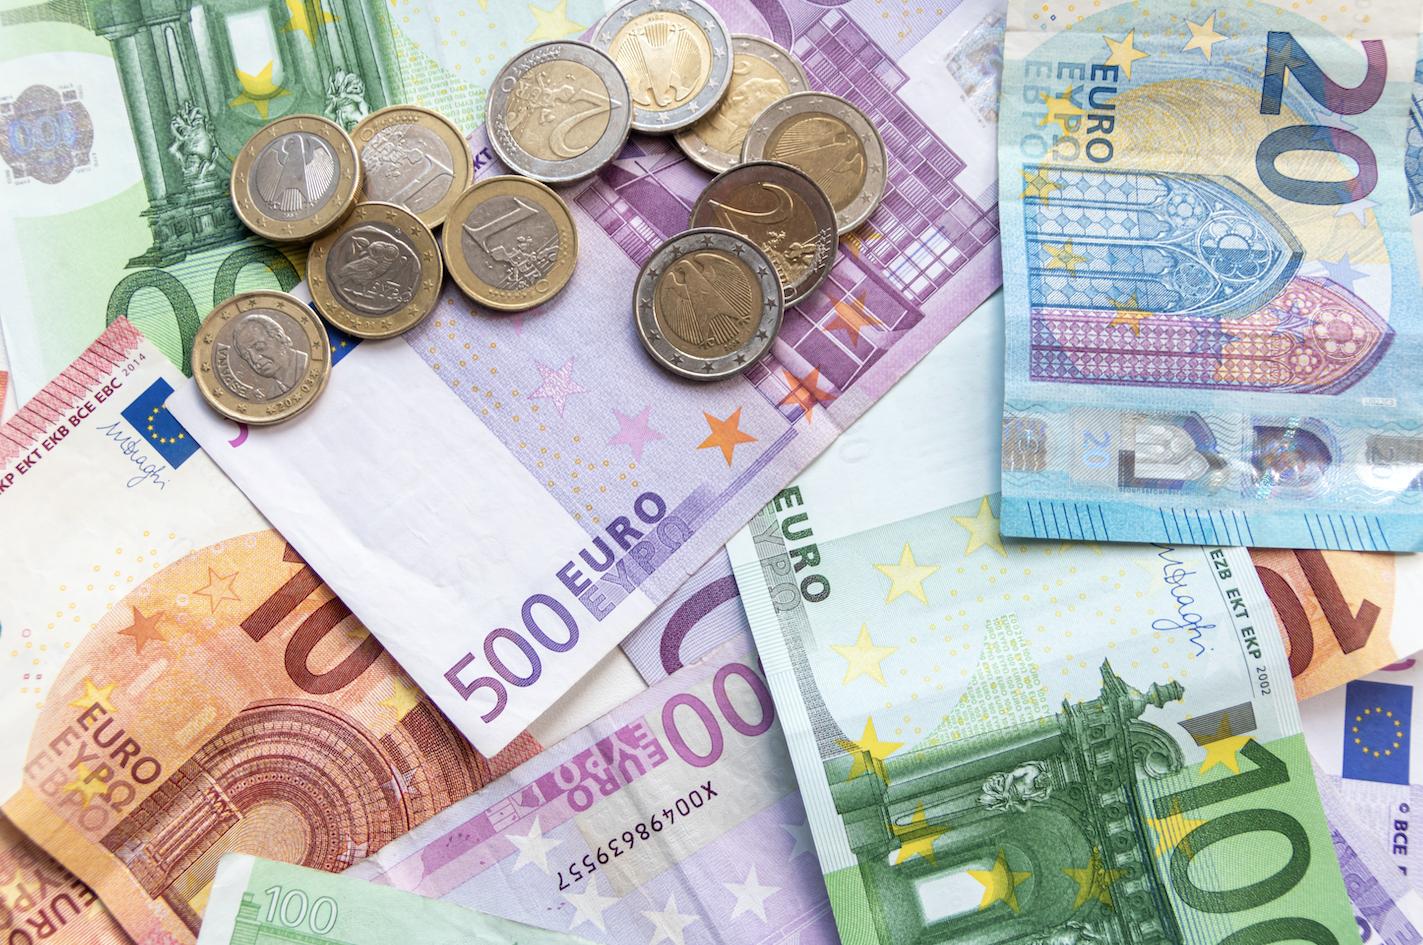 Insurtech Nimbla launches European export insurance for UK SMEs